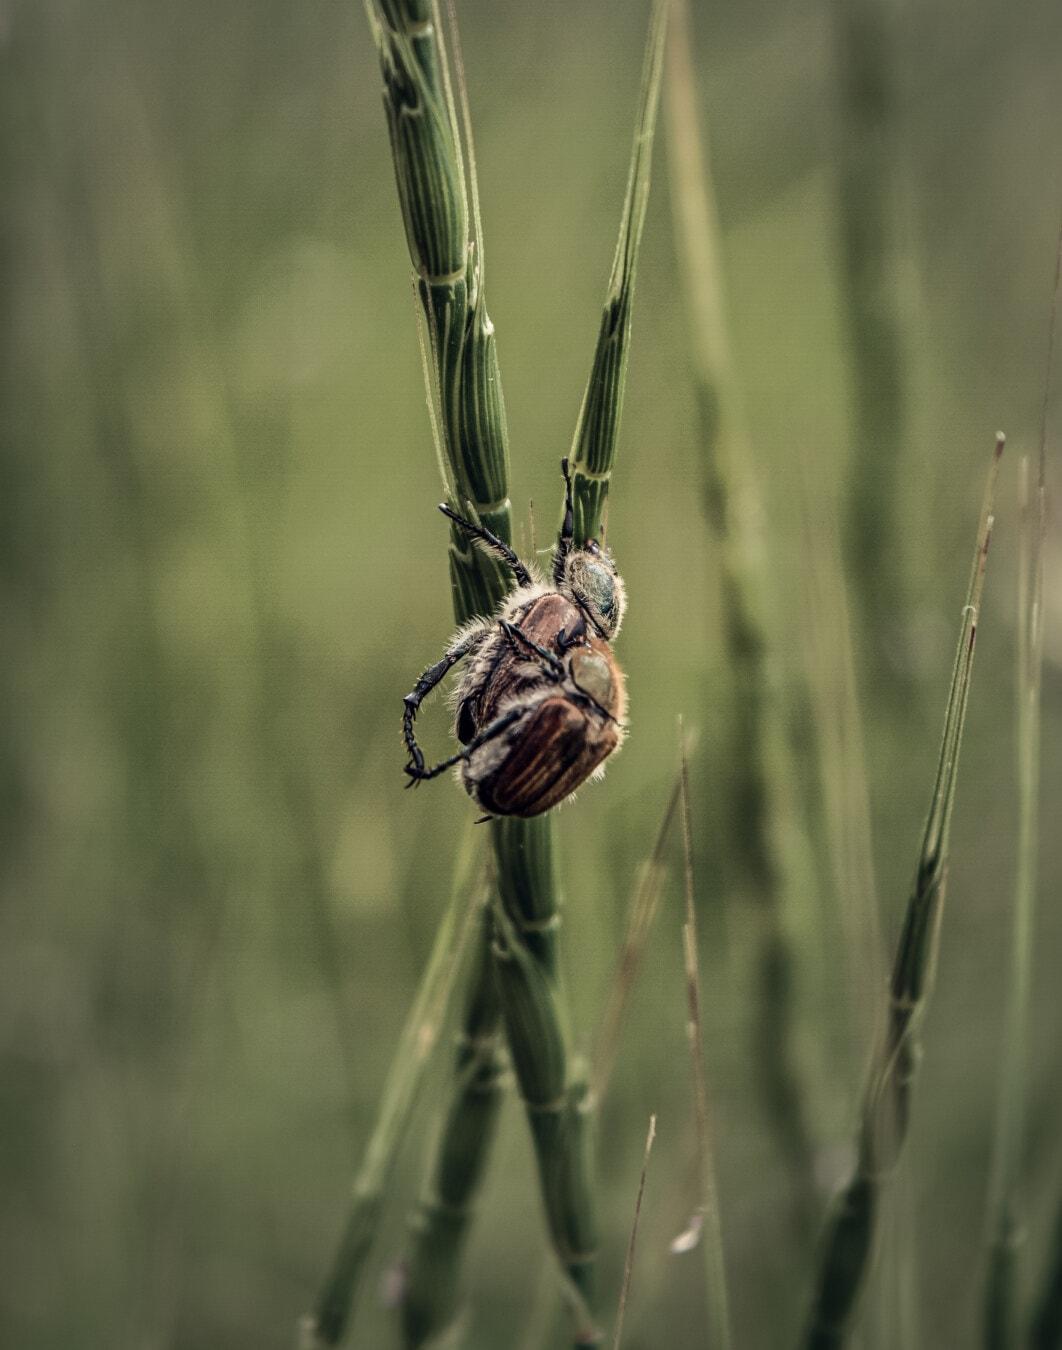 Käfer, Makro, Braun, Insekt, Gras, aus nächster Nähe, wirbellos, Natur, Nahansicht, Tierwelt